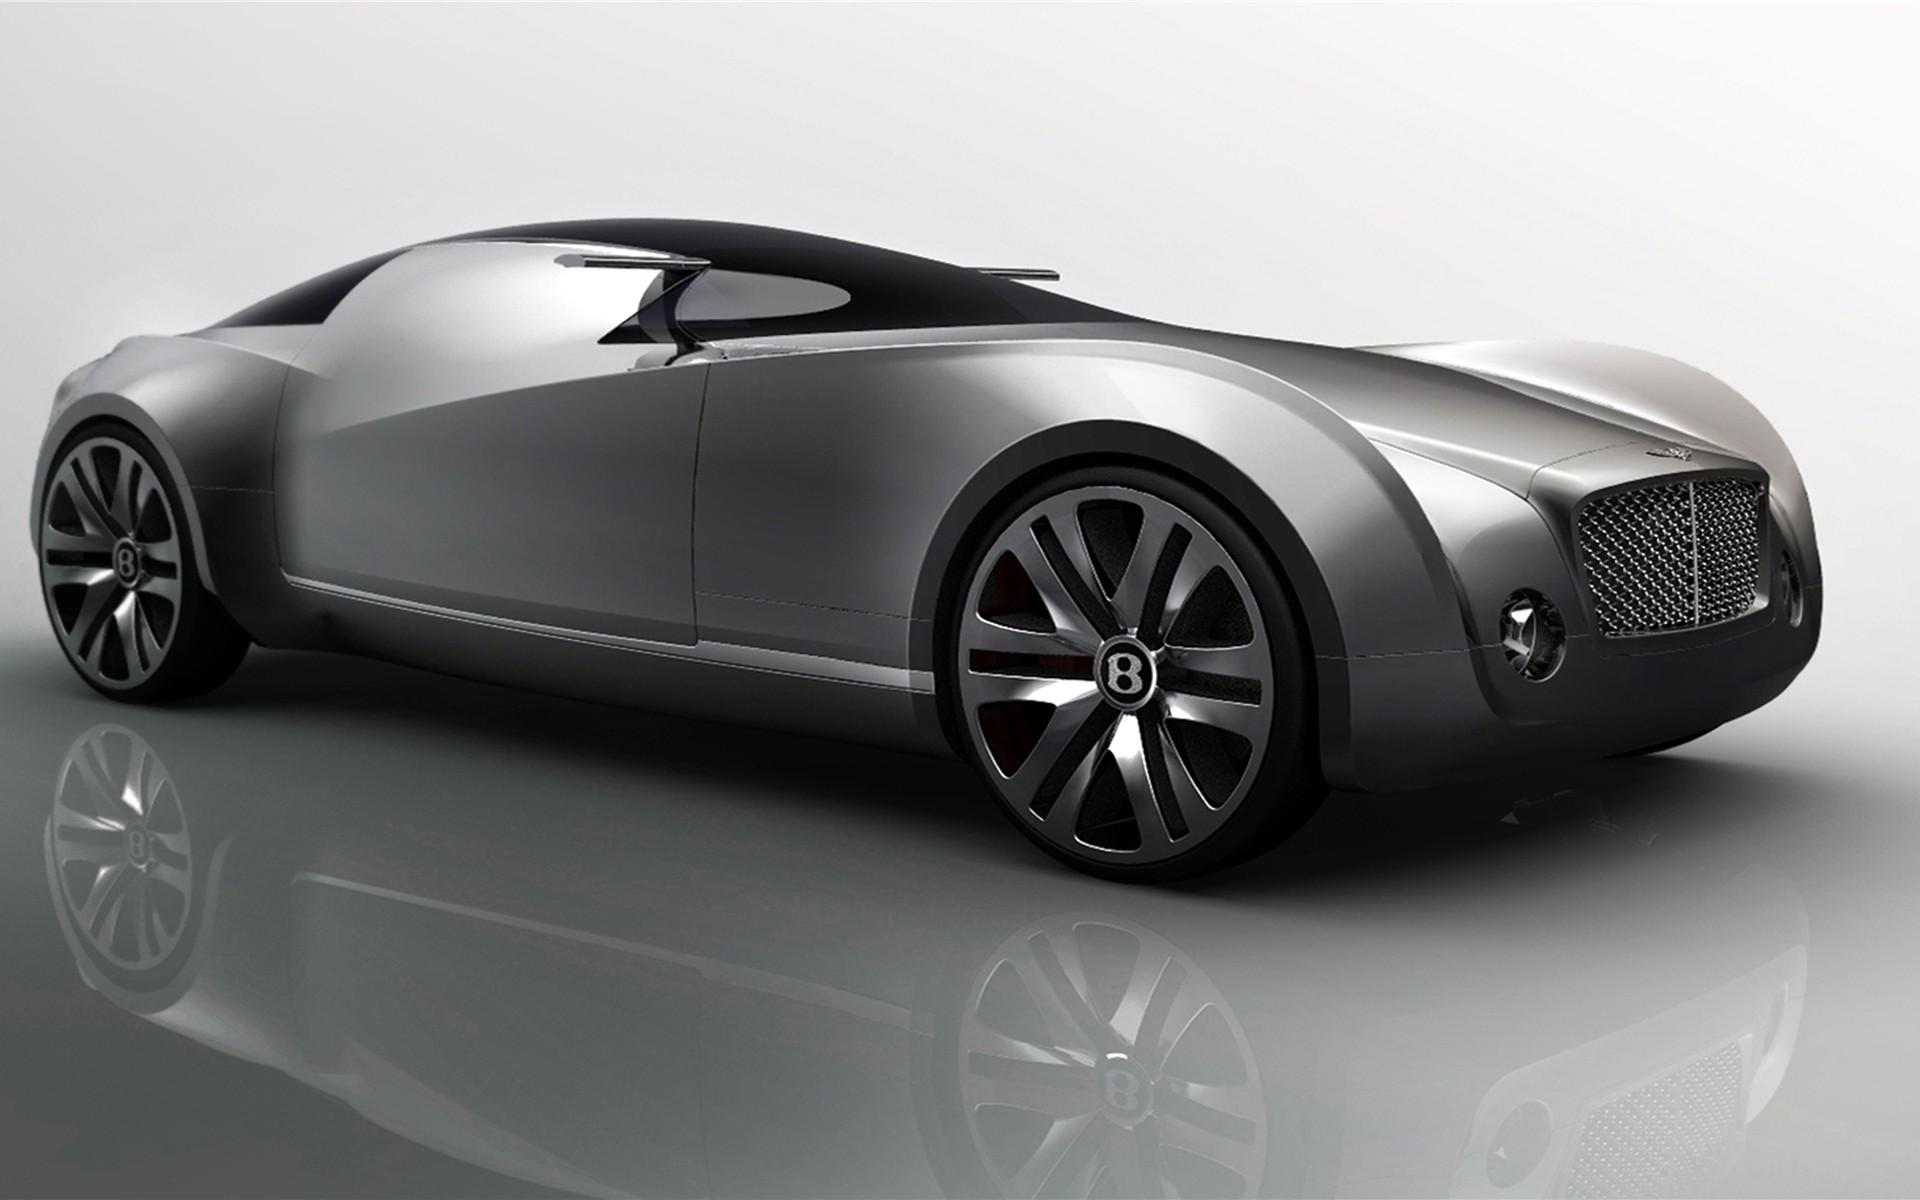 Bentley future international design stars wallpaper hd - Future cars hd wallpapers ...